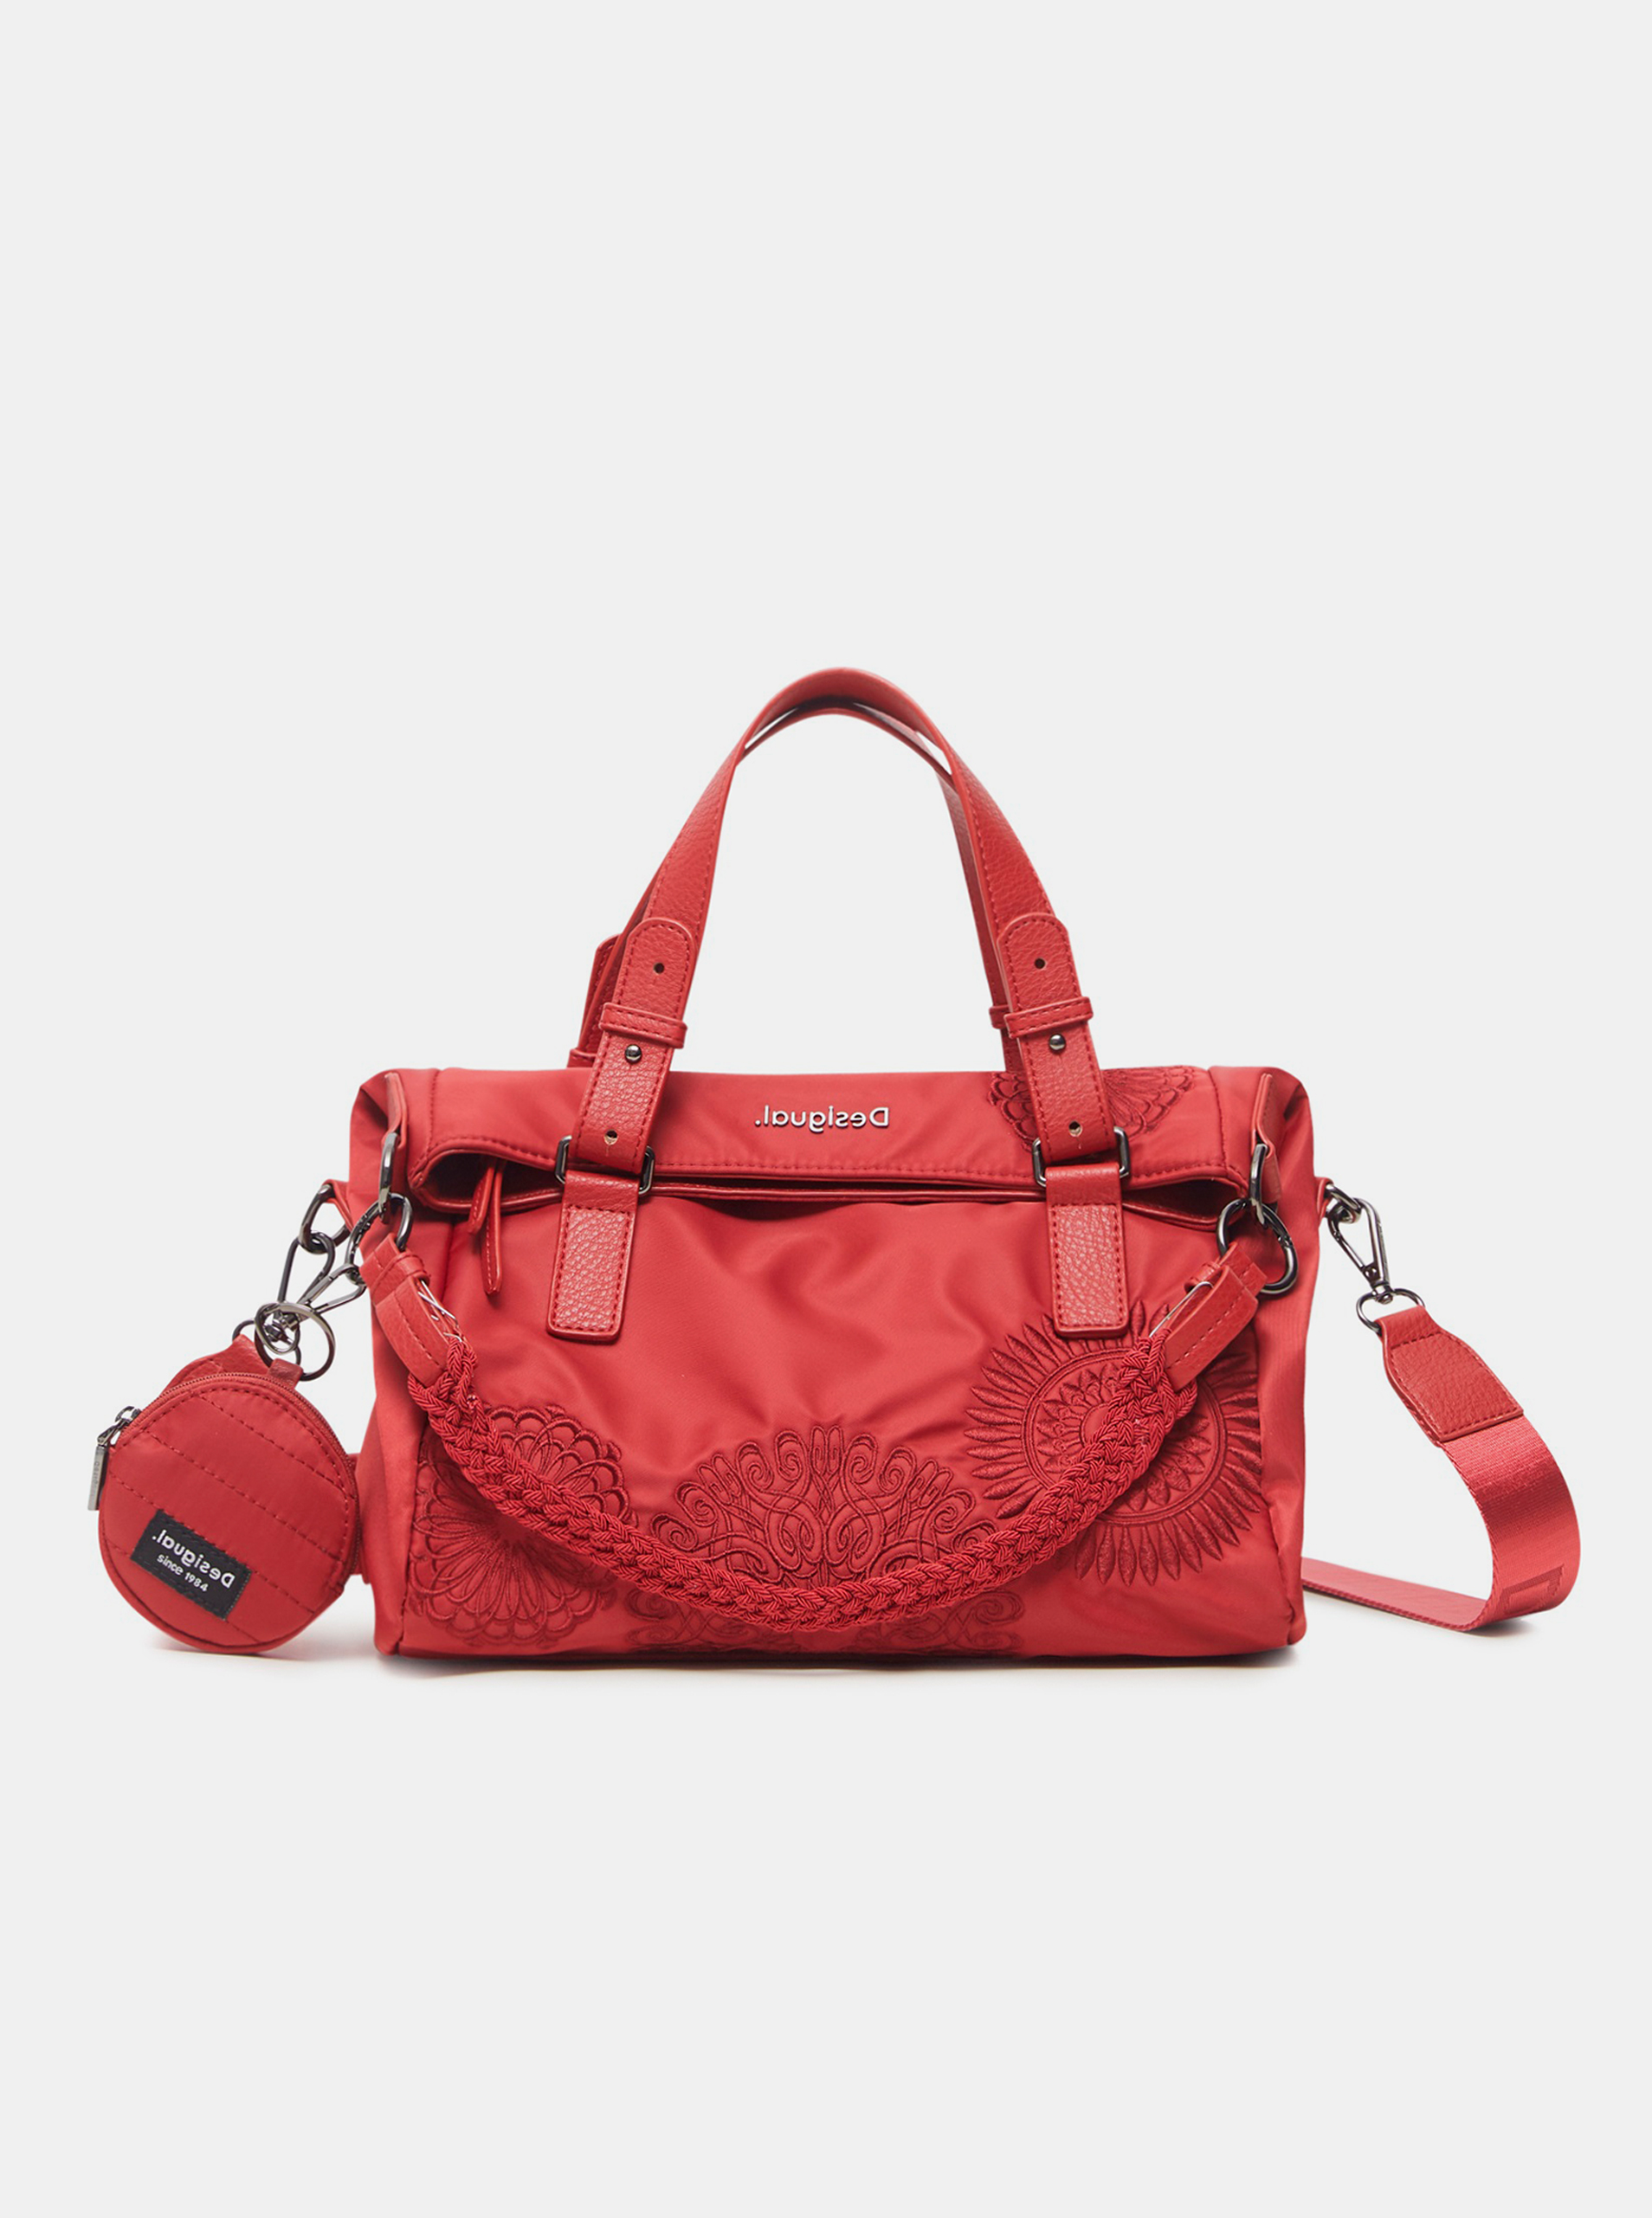 Desigual Women's bag red  Mandrala